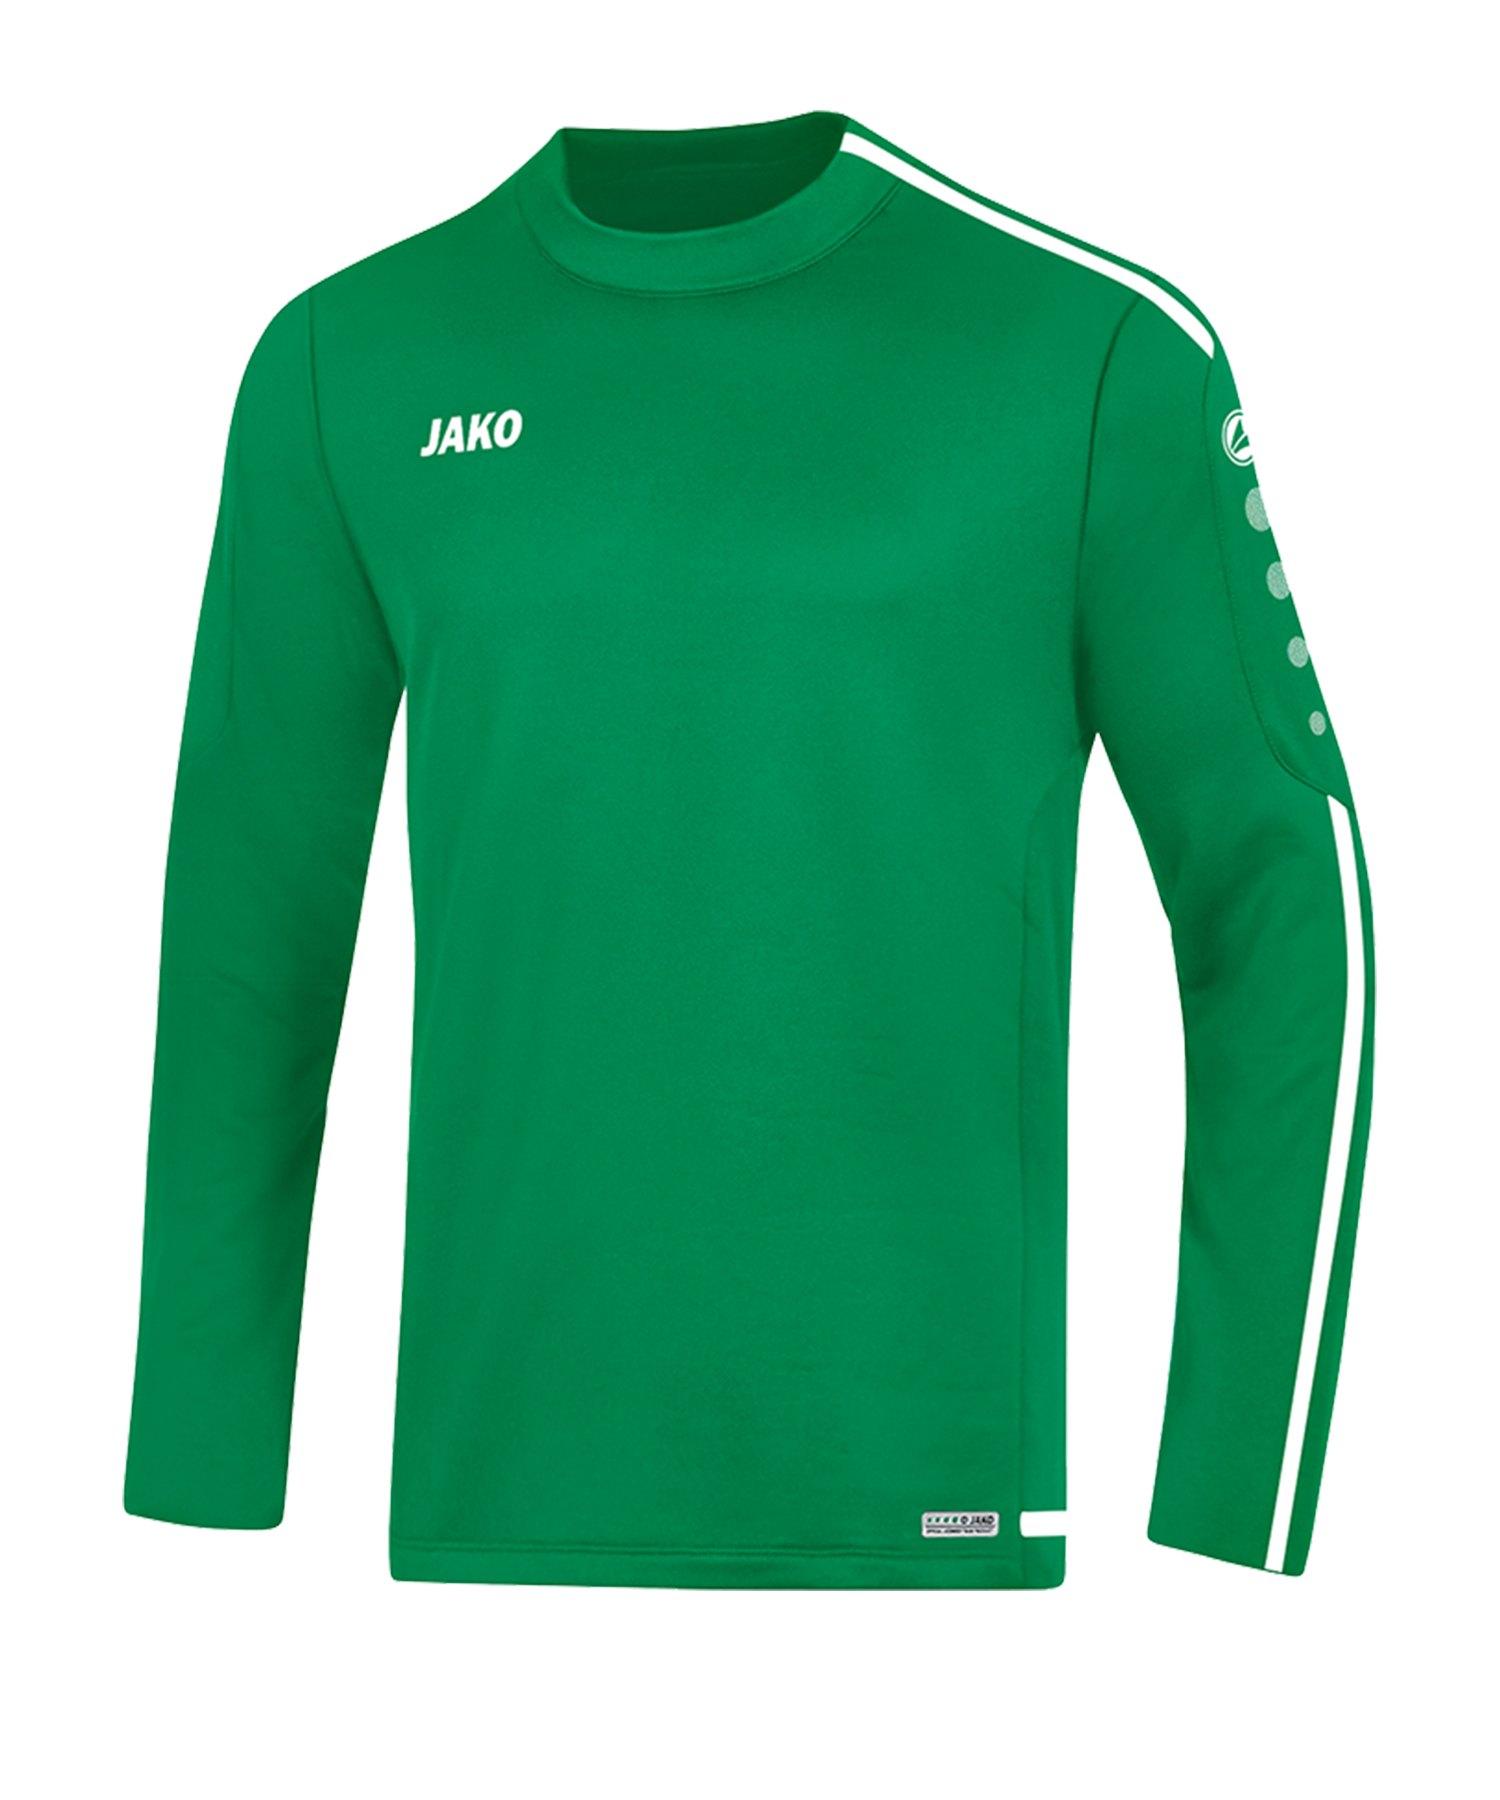 Jako Striker 2.0 Sweatshirt Kids Grün Weiss F06 - Gruen